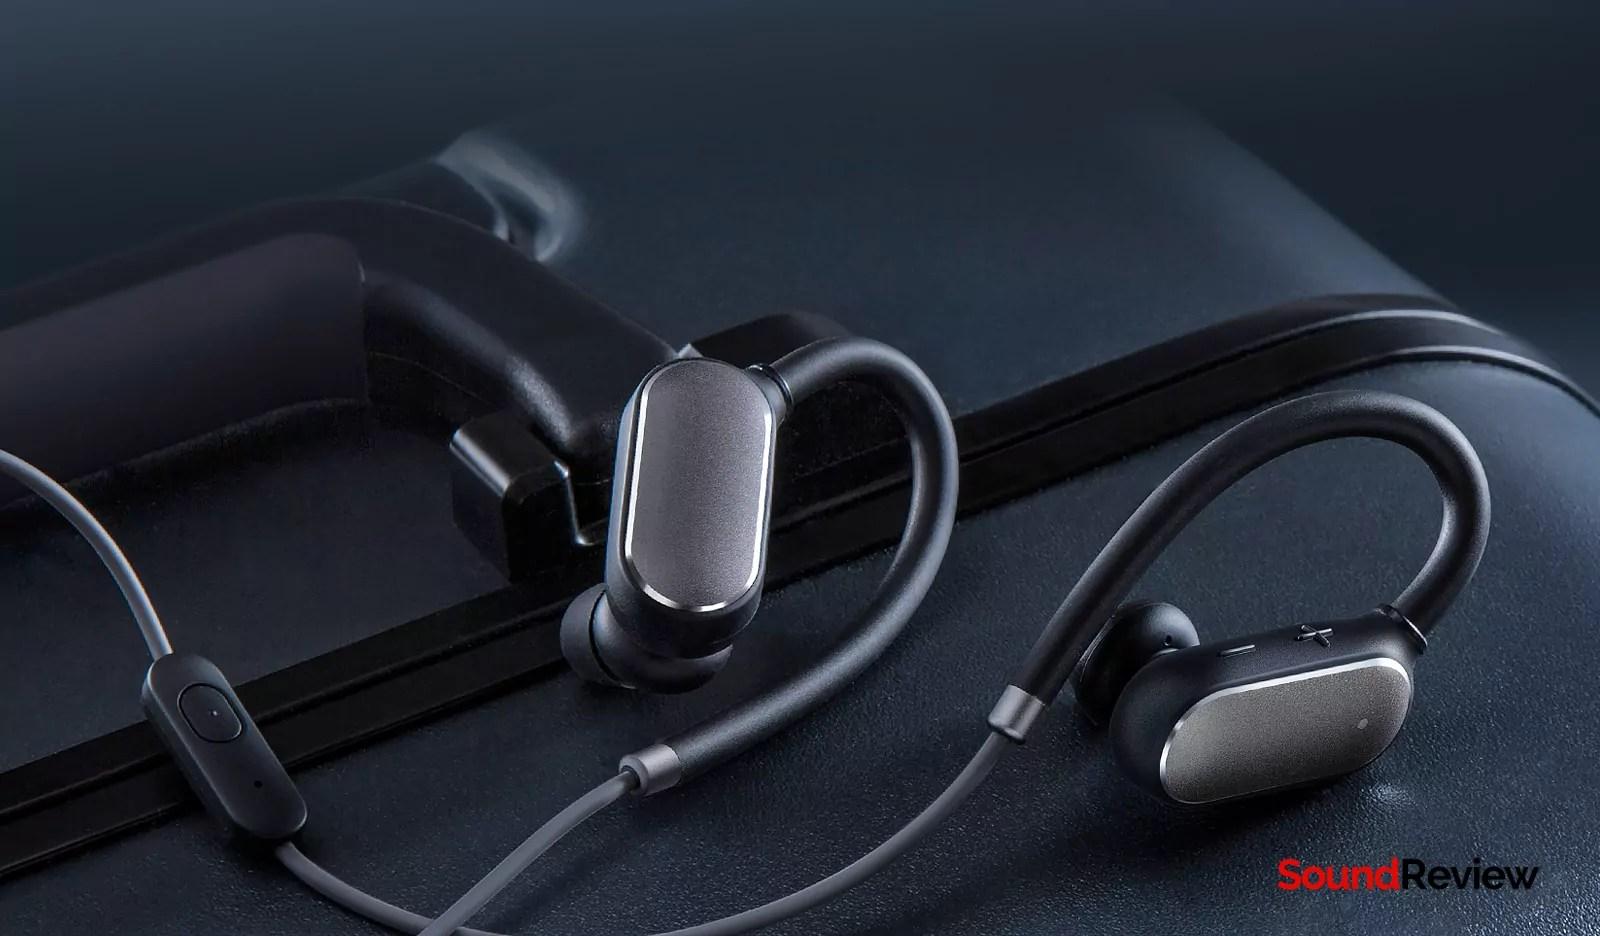 Xiaomi Mi Sports Bluetooth Headset To Debut On November 11 Soundphile Review